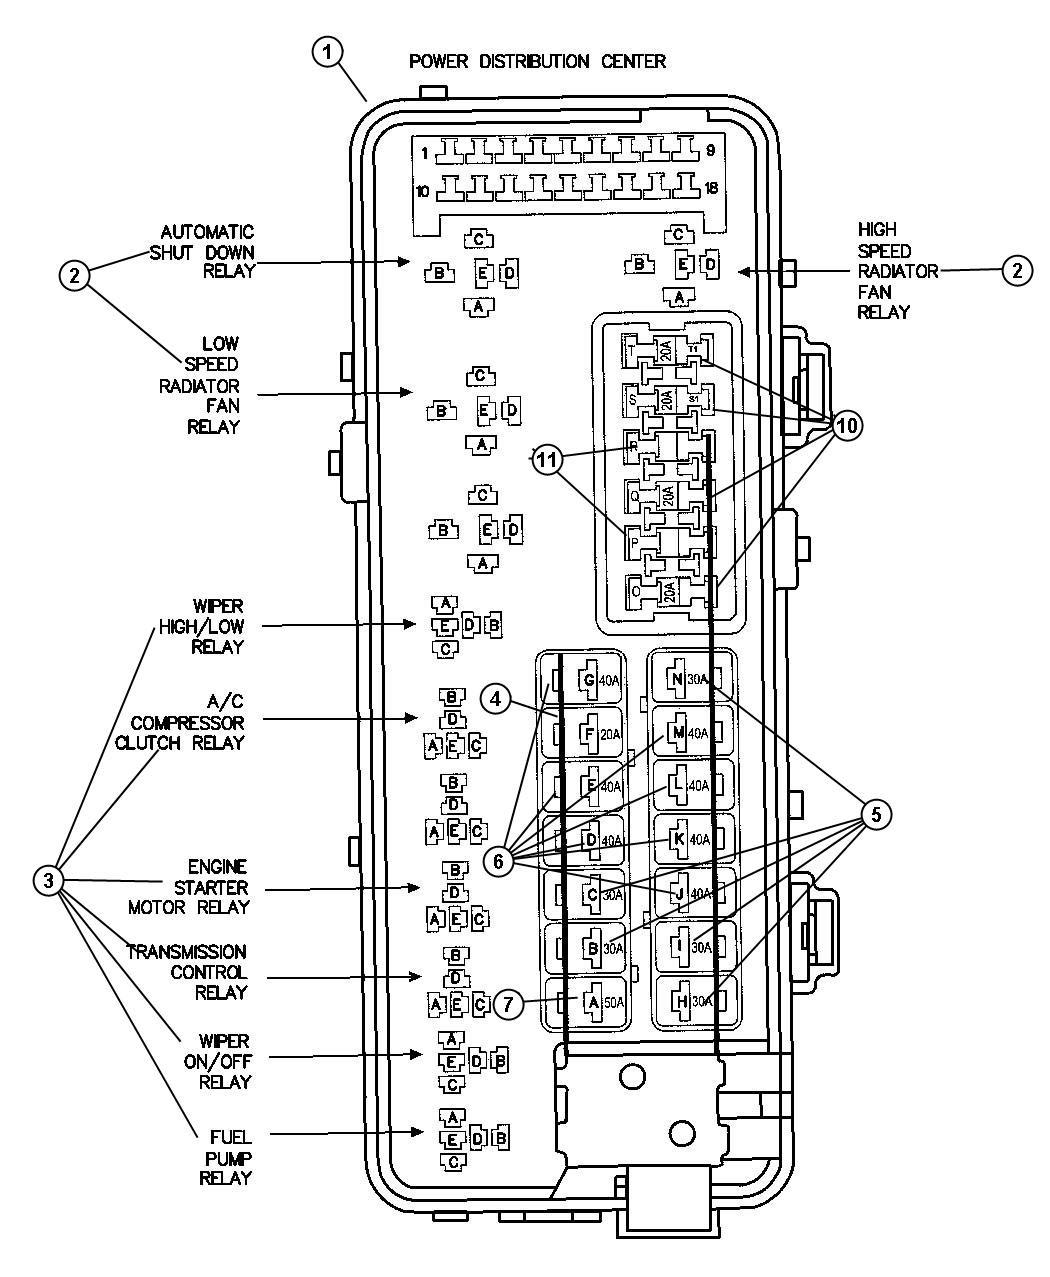 1995 Dodge Intrepid Engine Diagram Wiring Diagram Resource A Resource A Led Illumina It